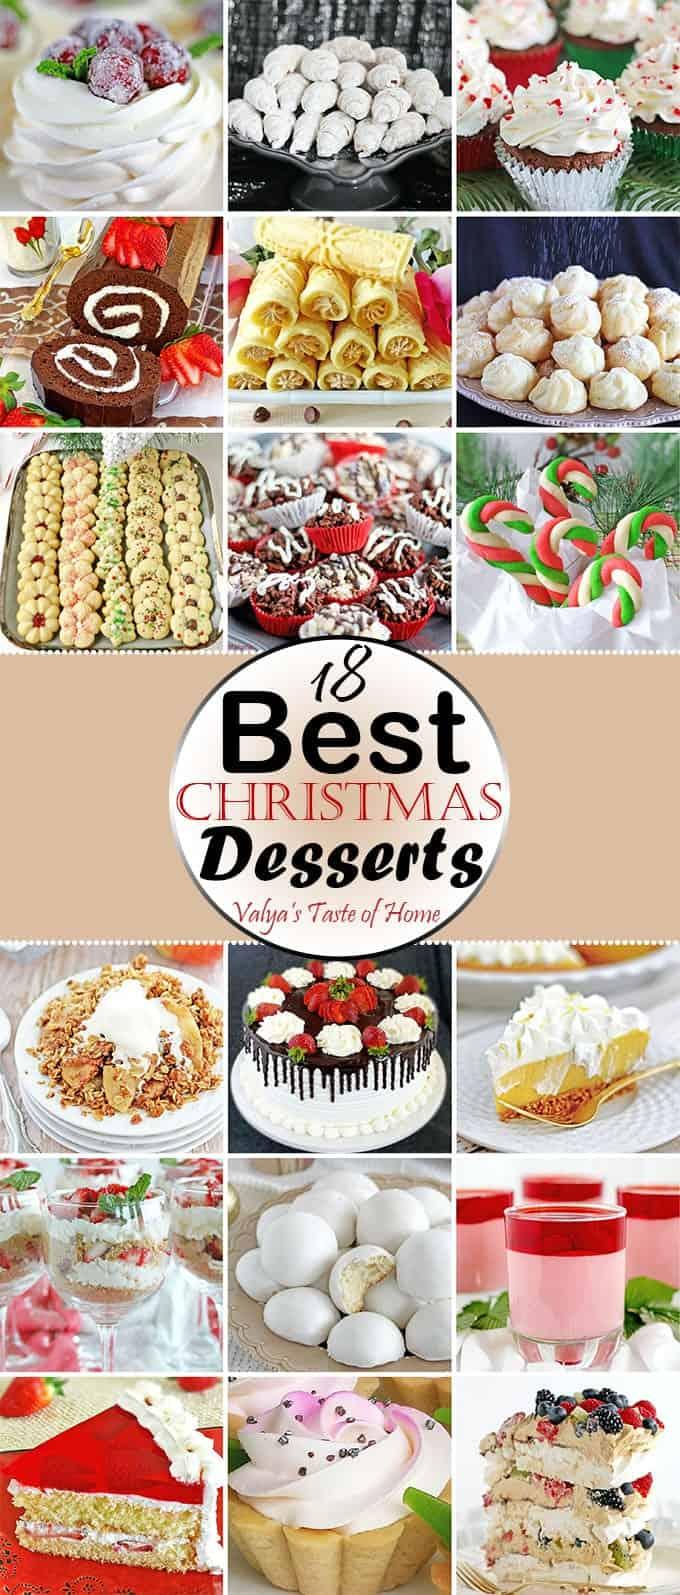 Taste of Home Christmas 2013